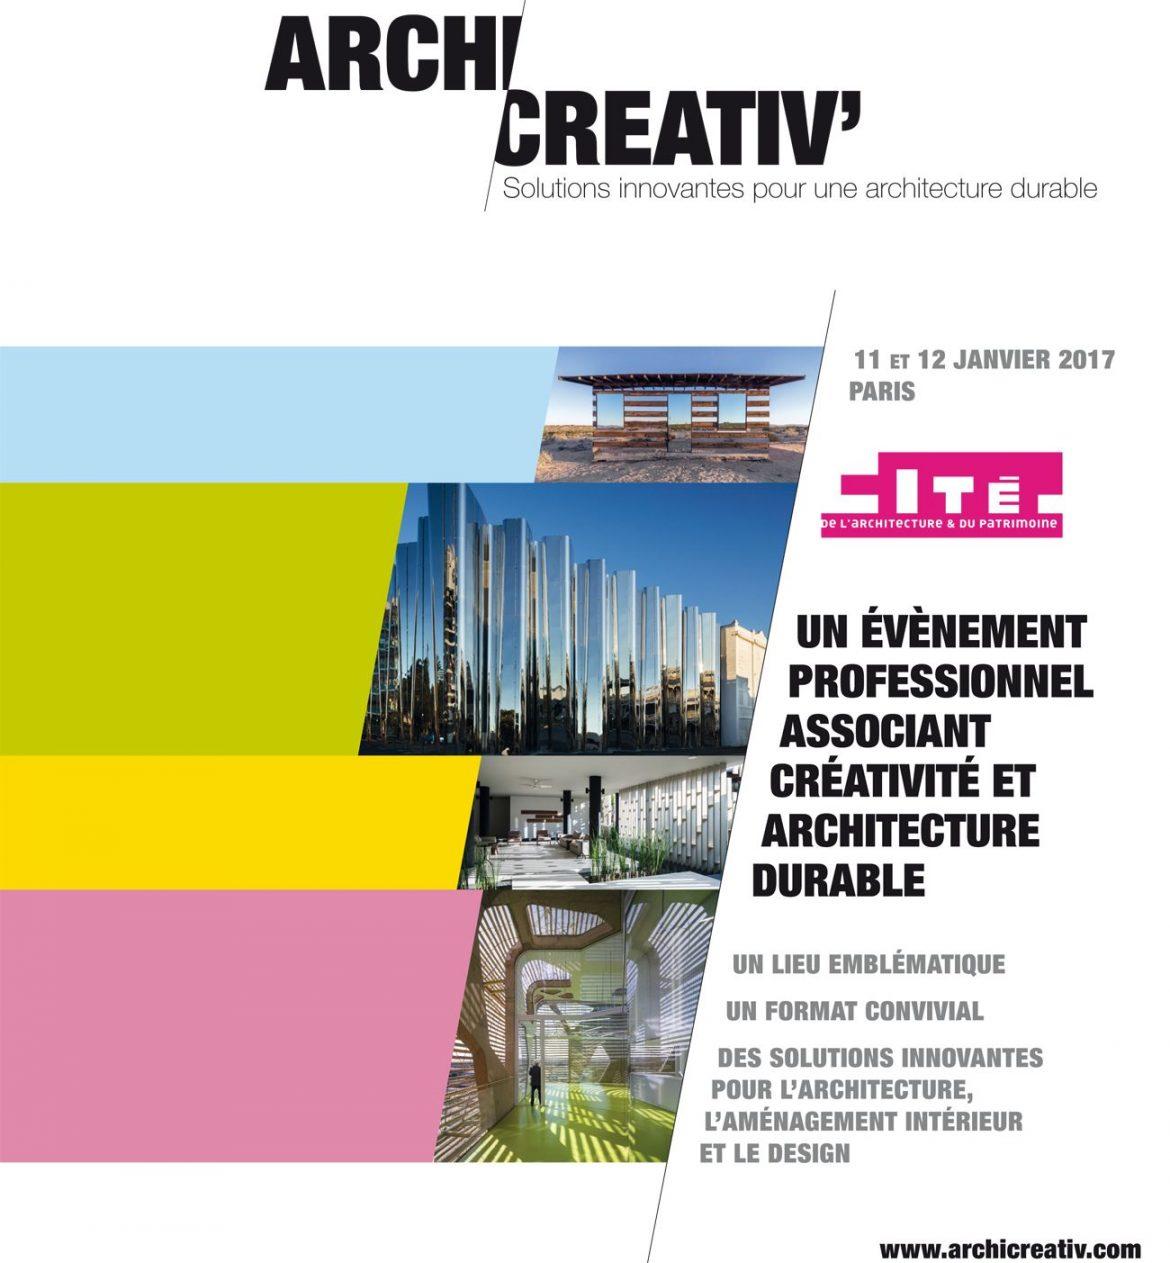 Archicreativ 1170x1263 - Archicreativ' : solutions innovantes pour une architecture durable